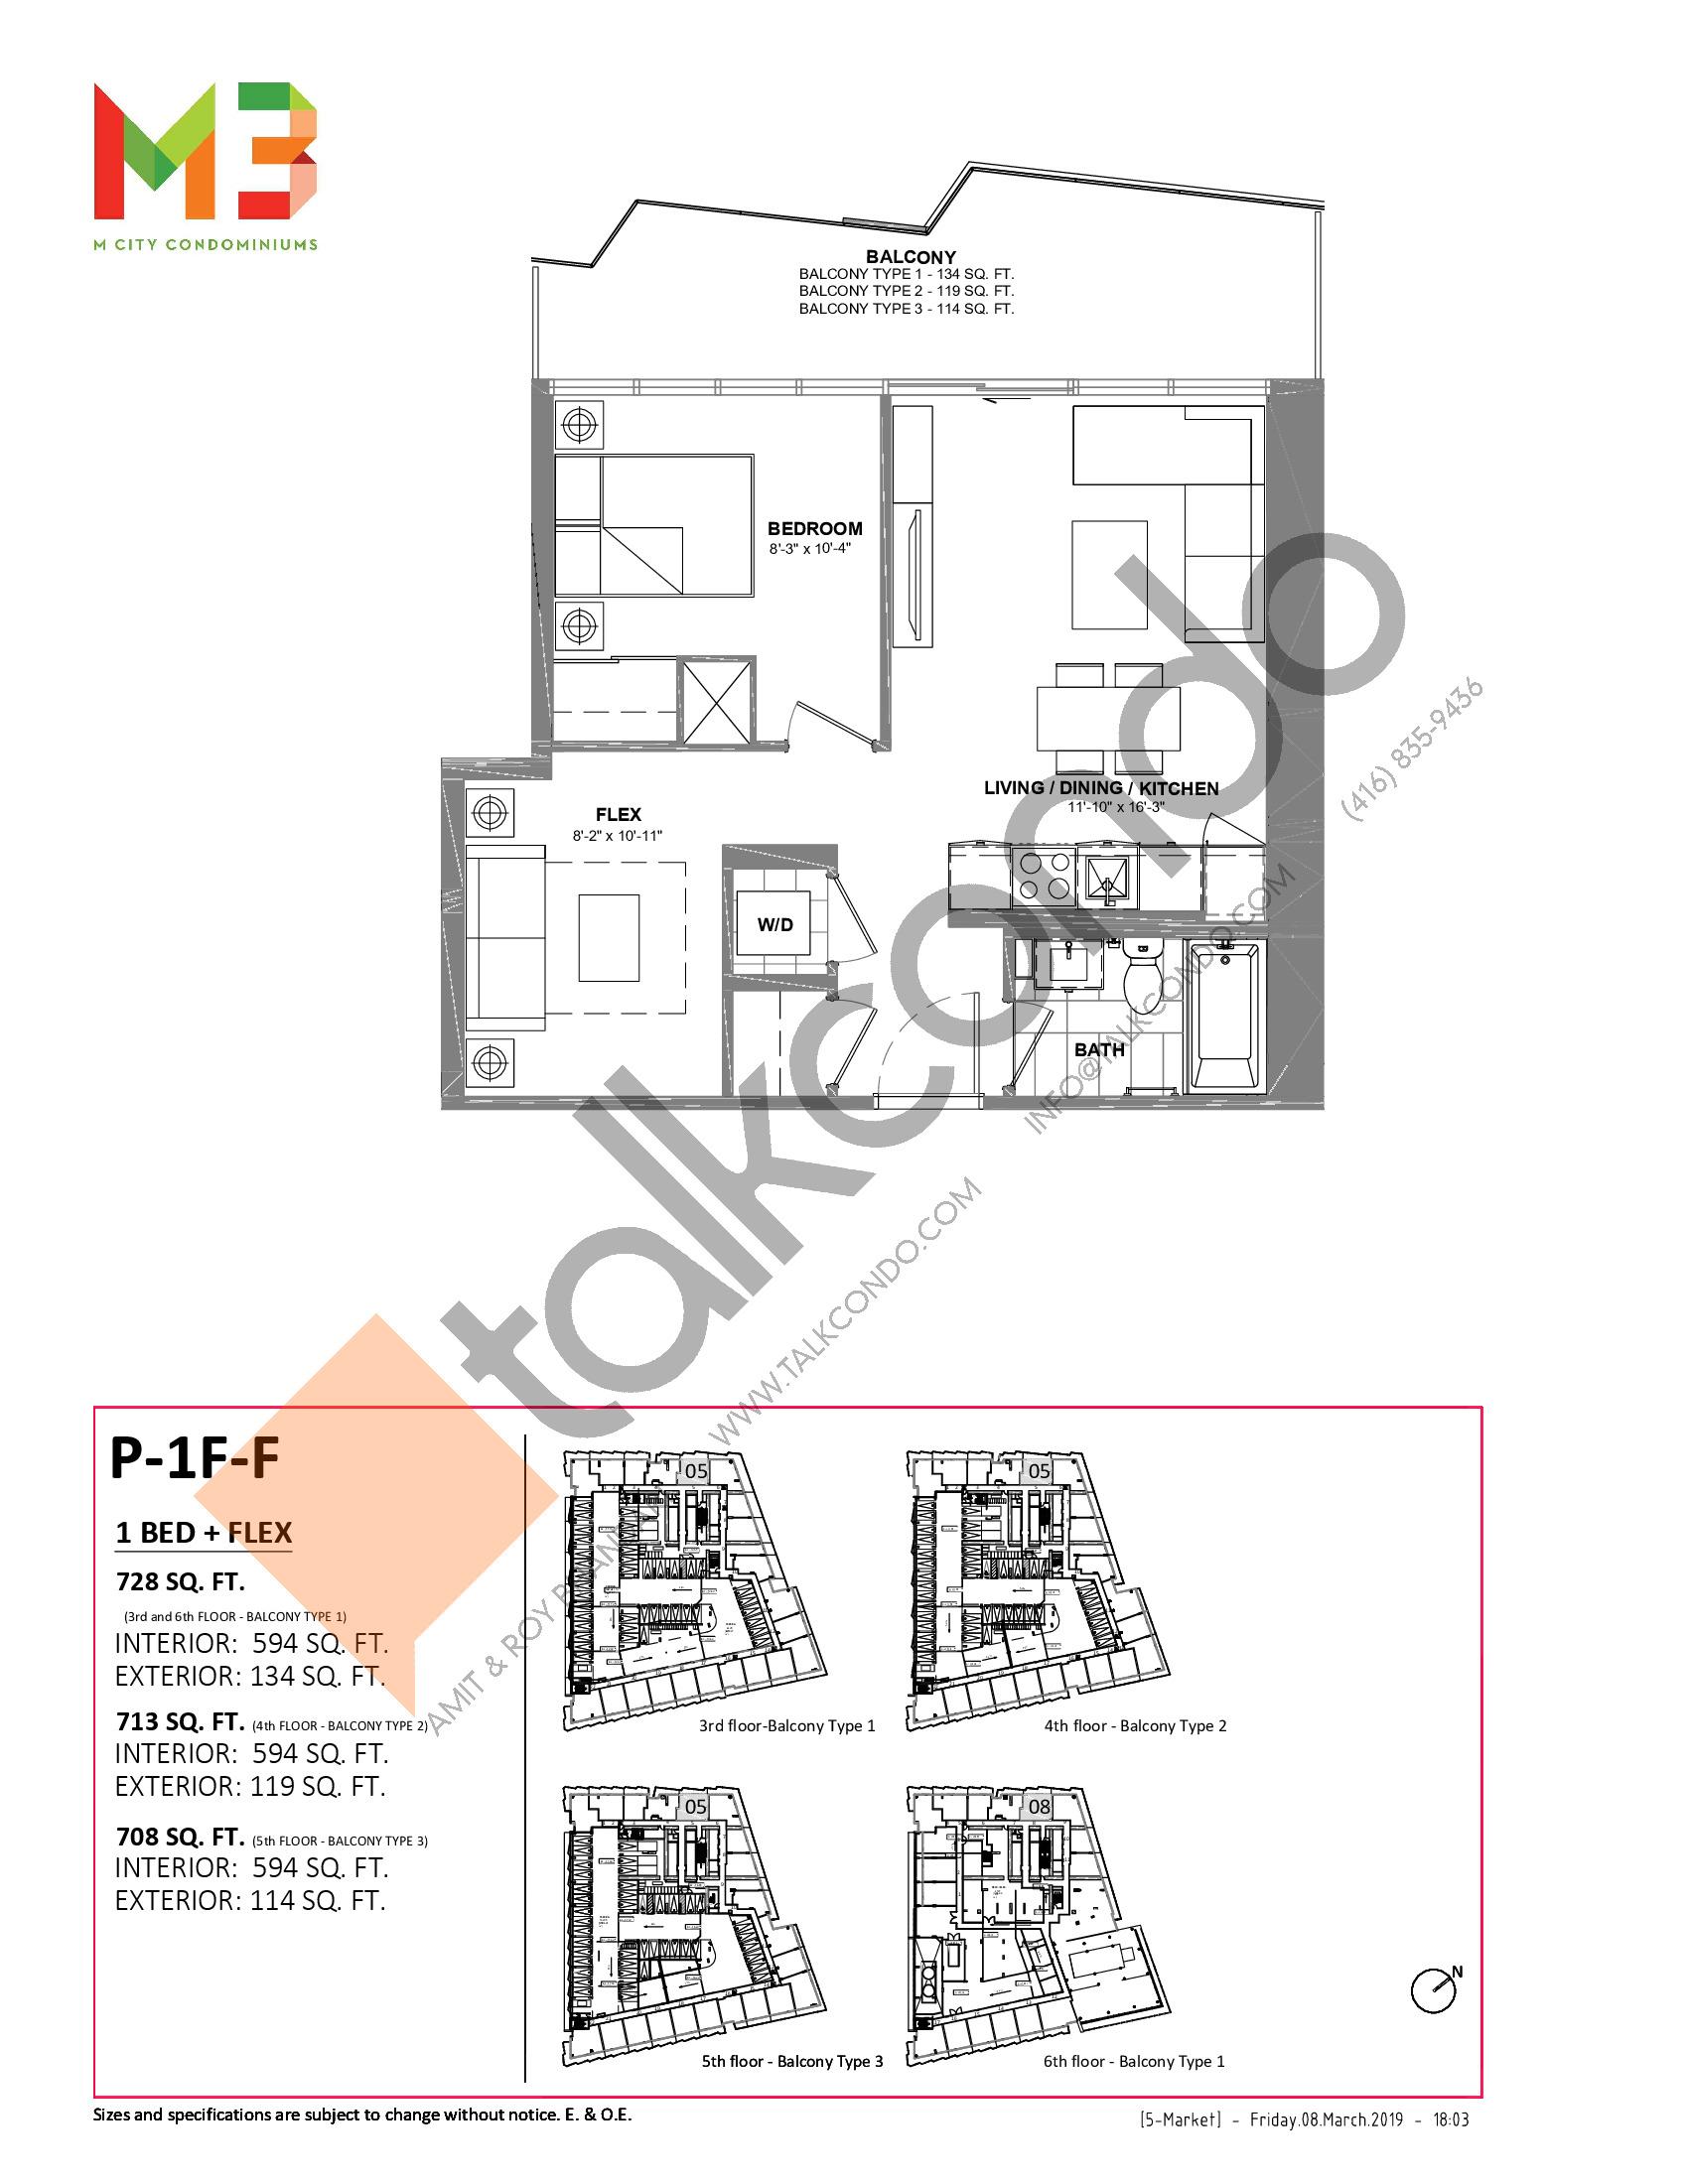 P-1F-F Floor Plan at M3 Condos - 594 sq.ft